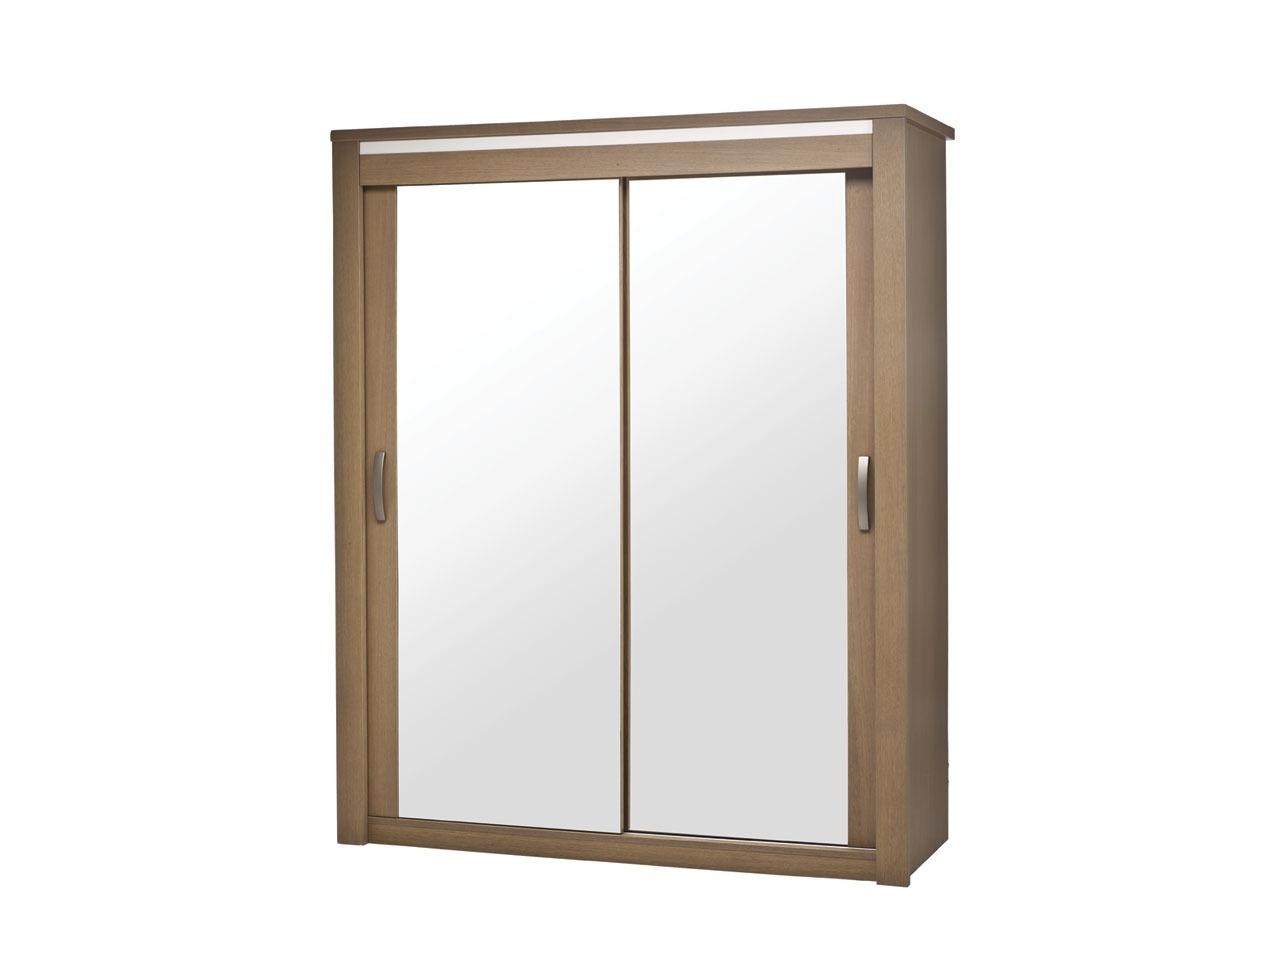 armoire 2 portes coulissantes miroir bahia laque perle - Armoire Portes Coulissantes Miroir